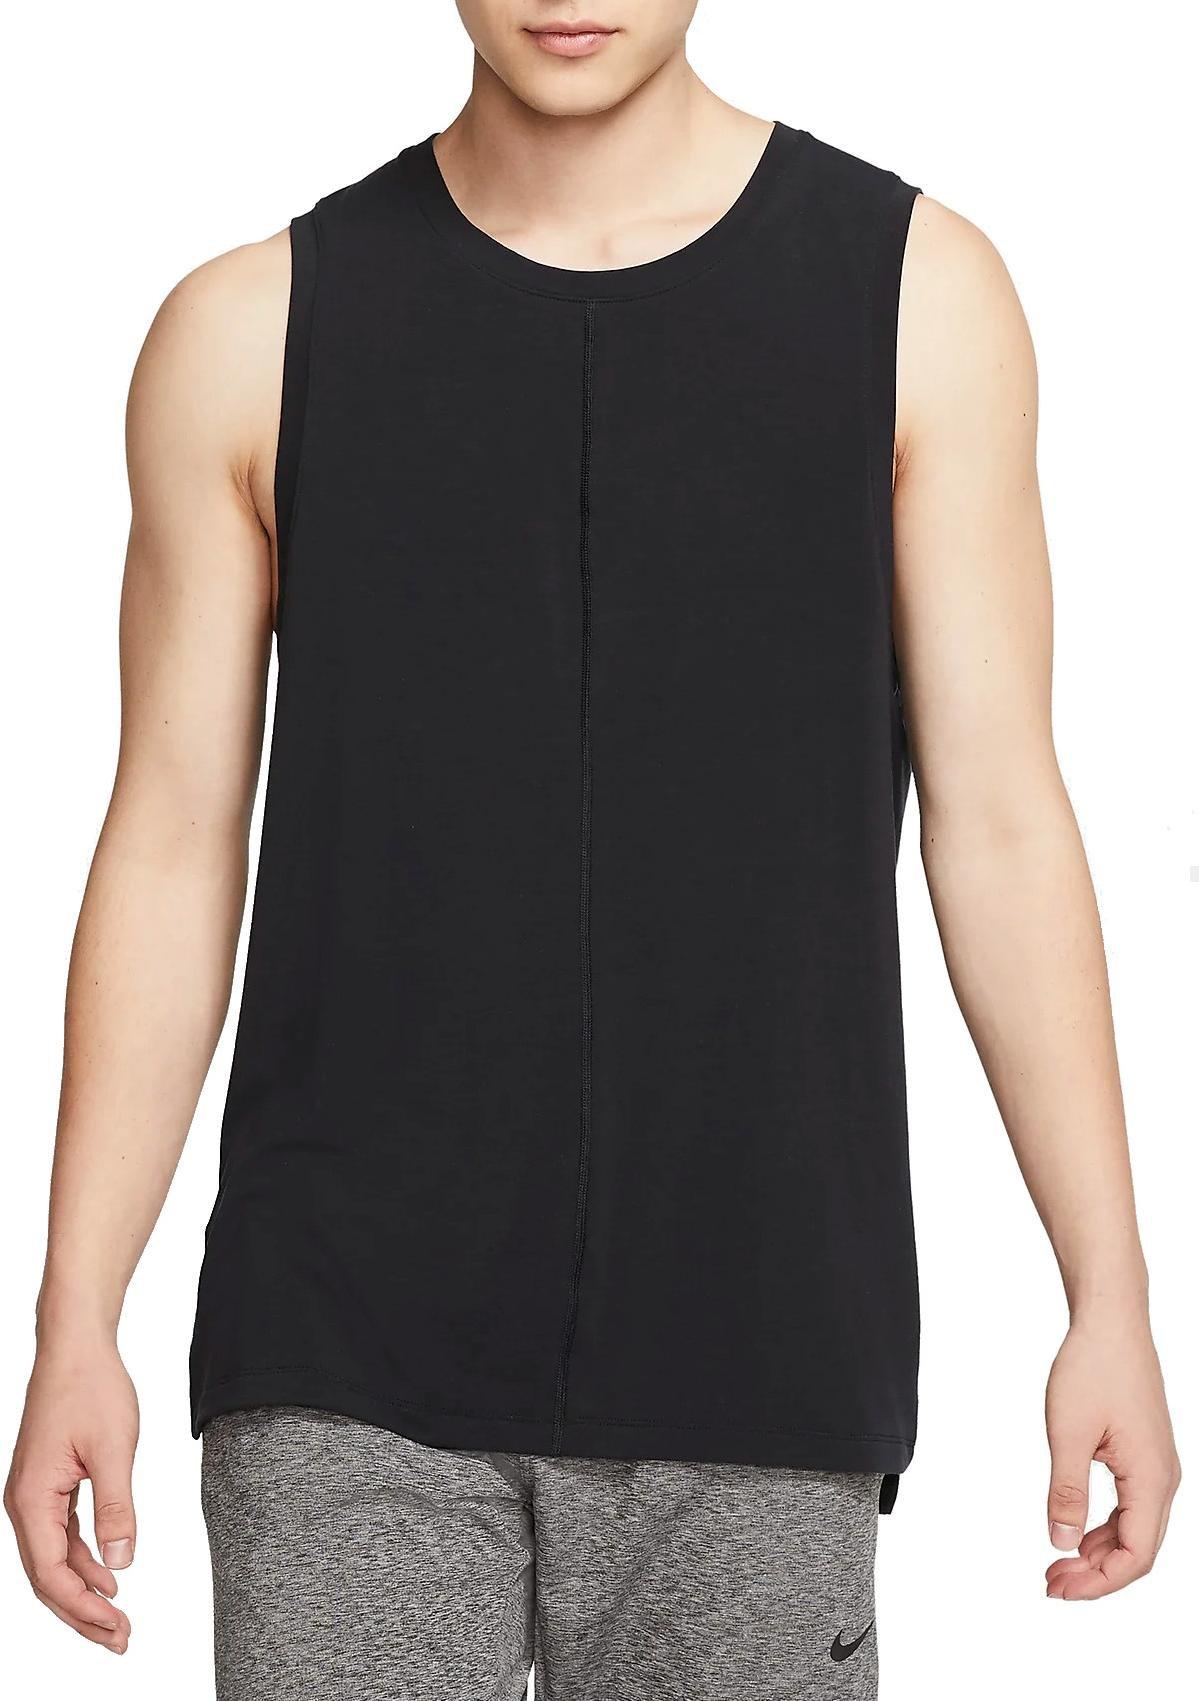 Tank Top Nike M Nk Dry Tank Yoga Top4fitness Com